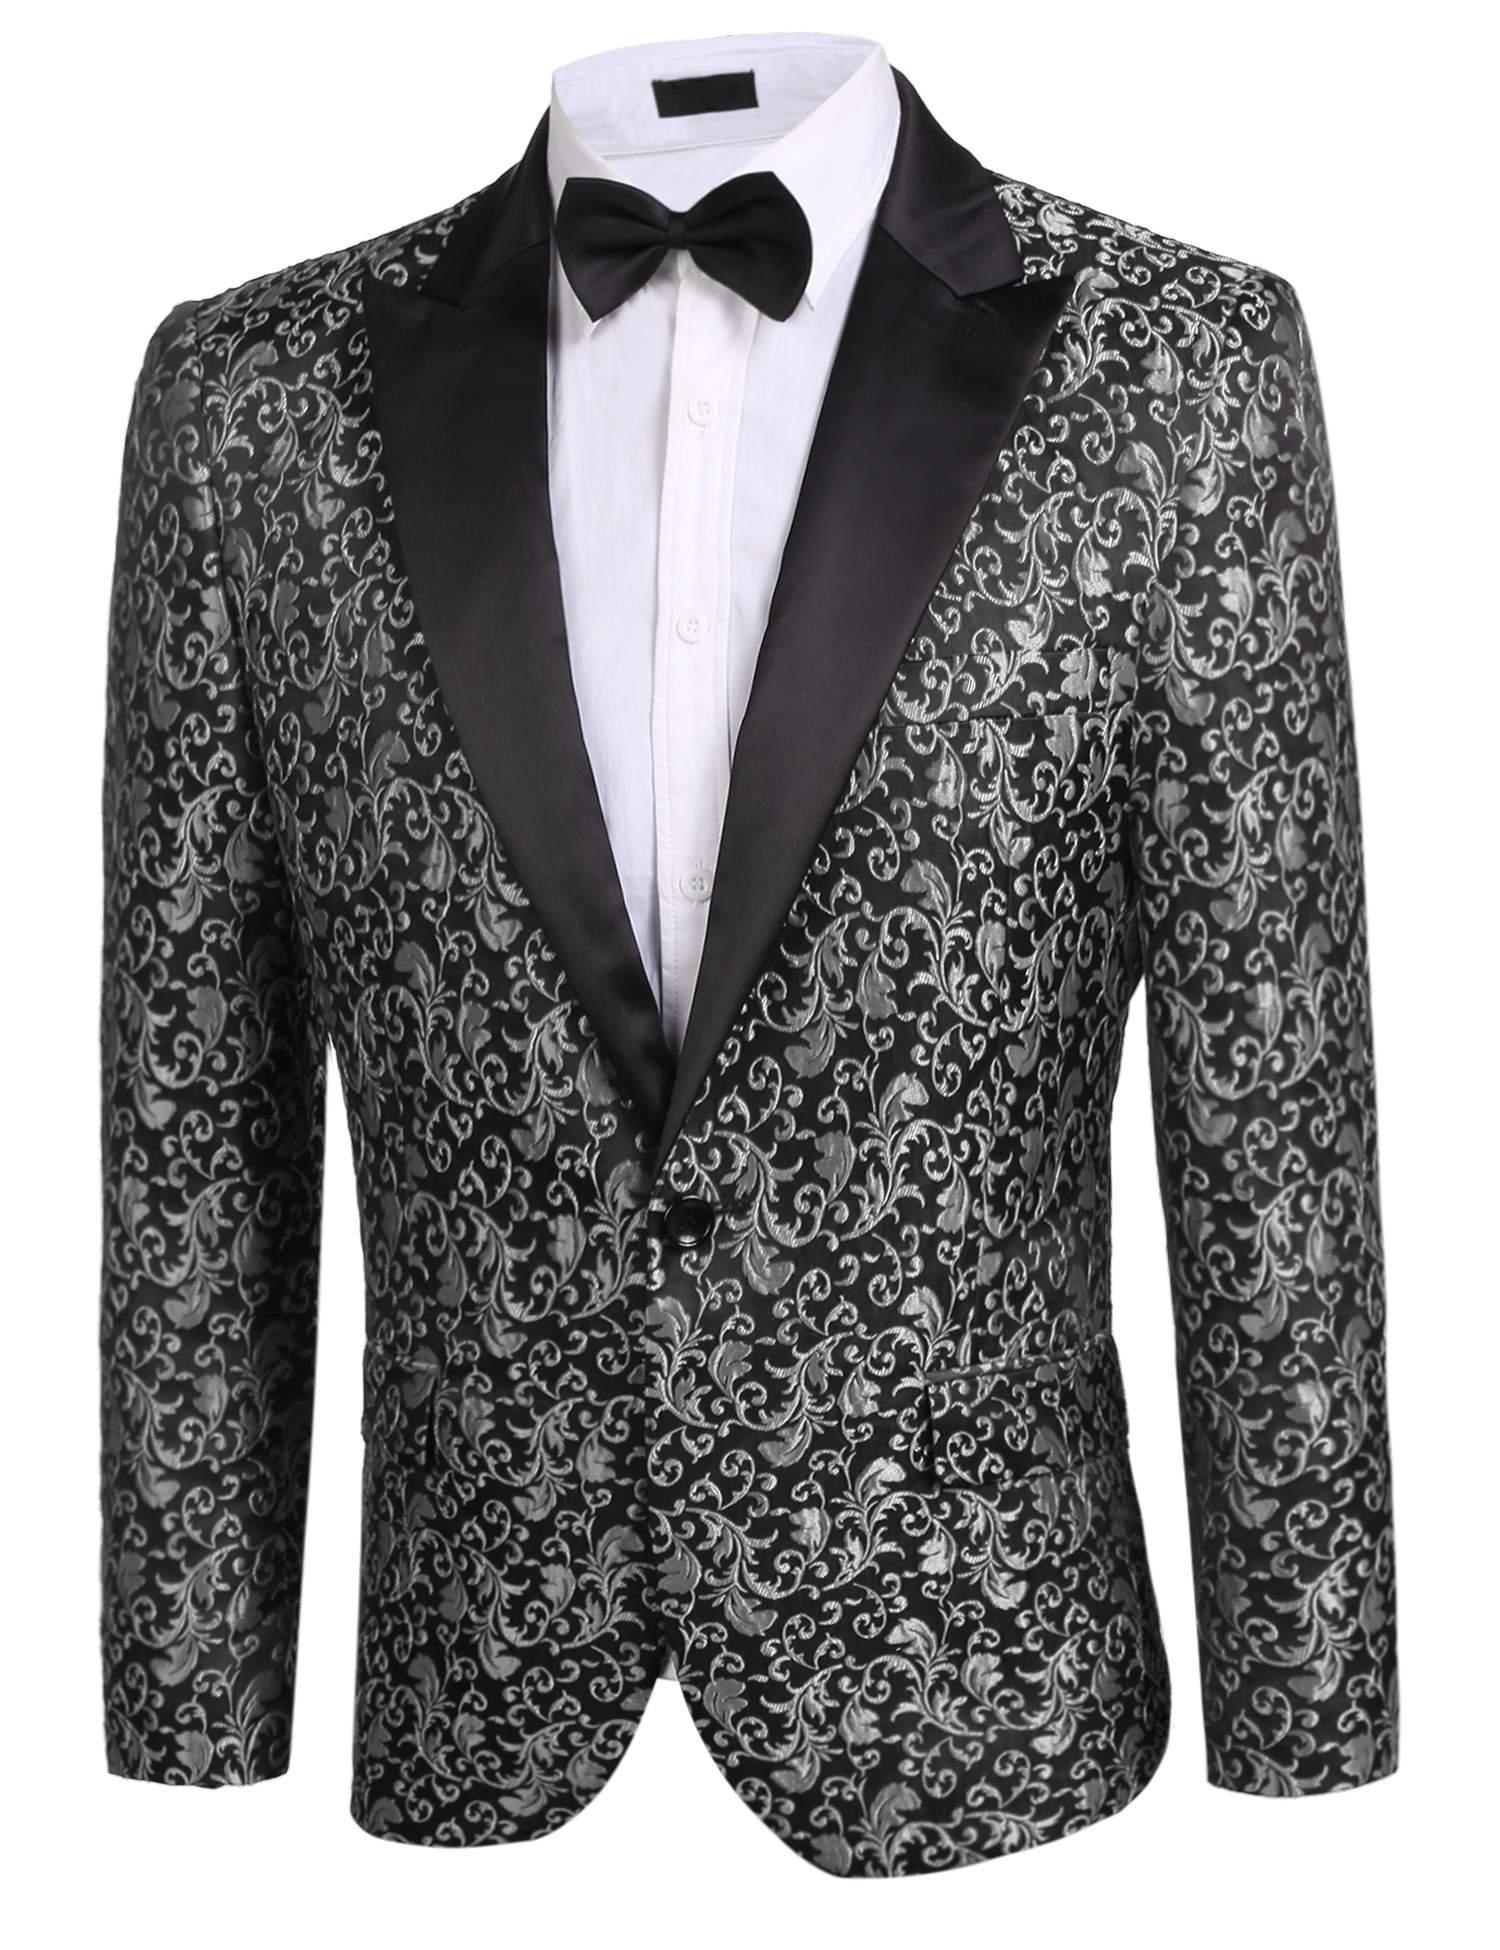 Donet Men's Floral Party Dress Suit Notched Lapel Stylish Dinner Jacket Wedding Blazer Prom Tuxedo Gray XX-Large